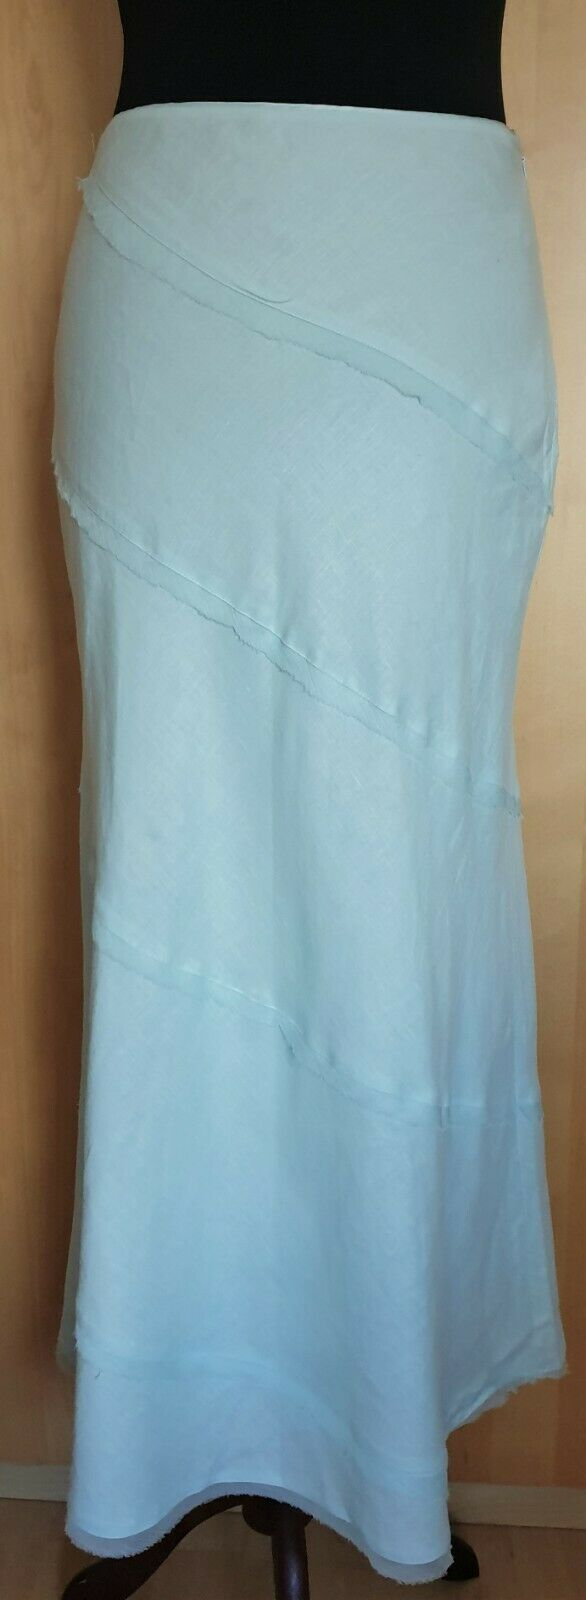 New Monsoon Aqua Grün 100% Linen Silk Trim Midi Long Skirt Größe 8 UK